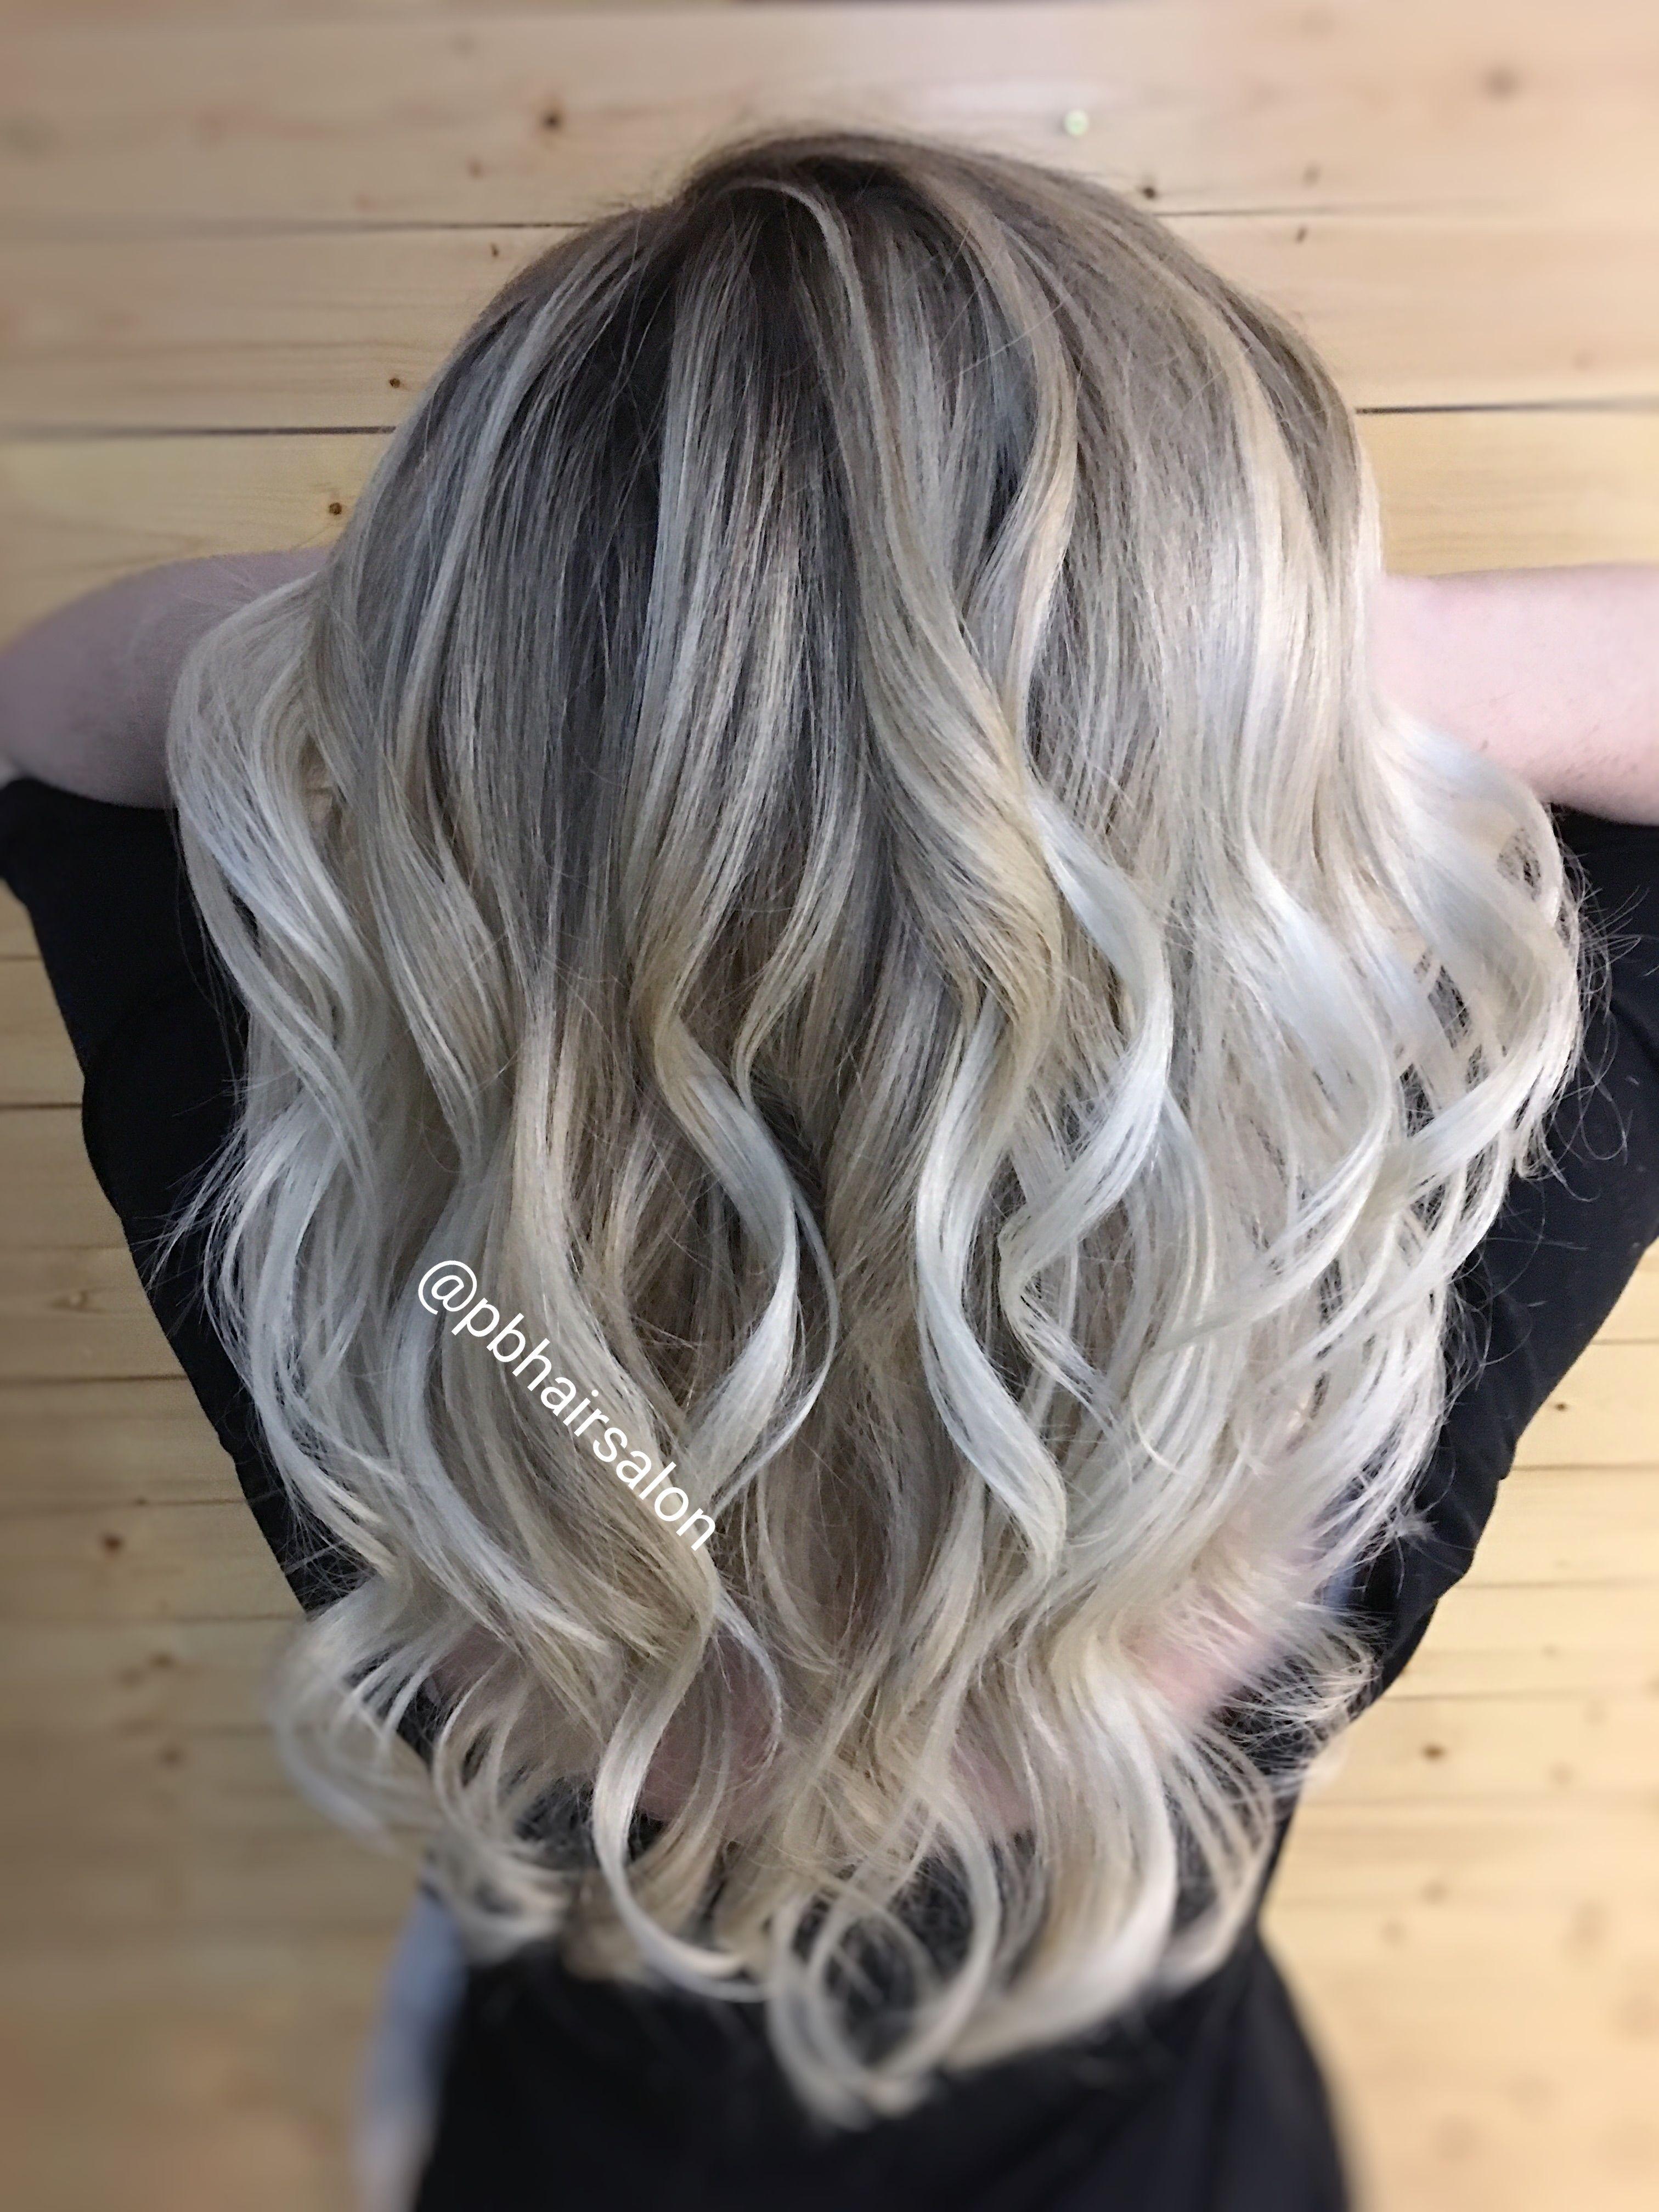 Icy Blonde Hair Balayage Pbhairsalon Icy Blonde Balayage Icy Blonde Hair Balayage